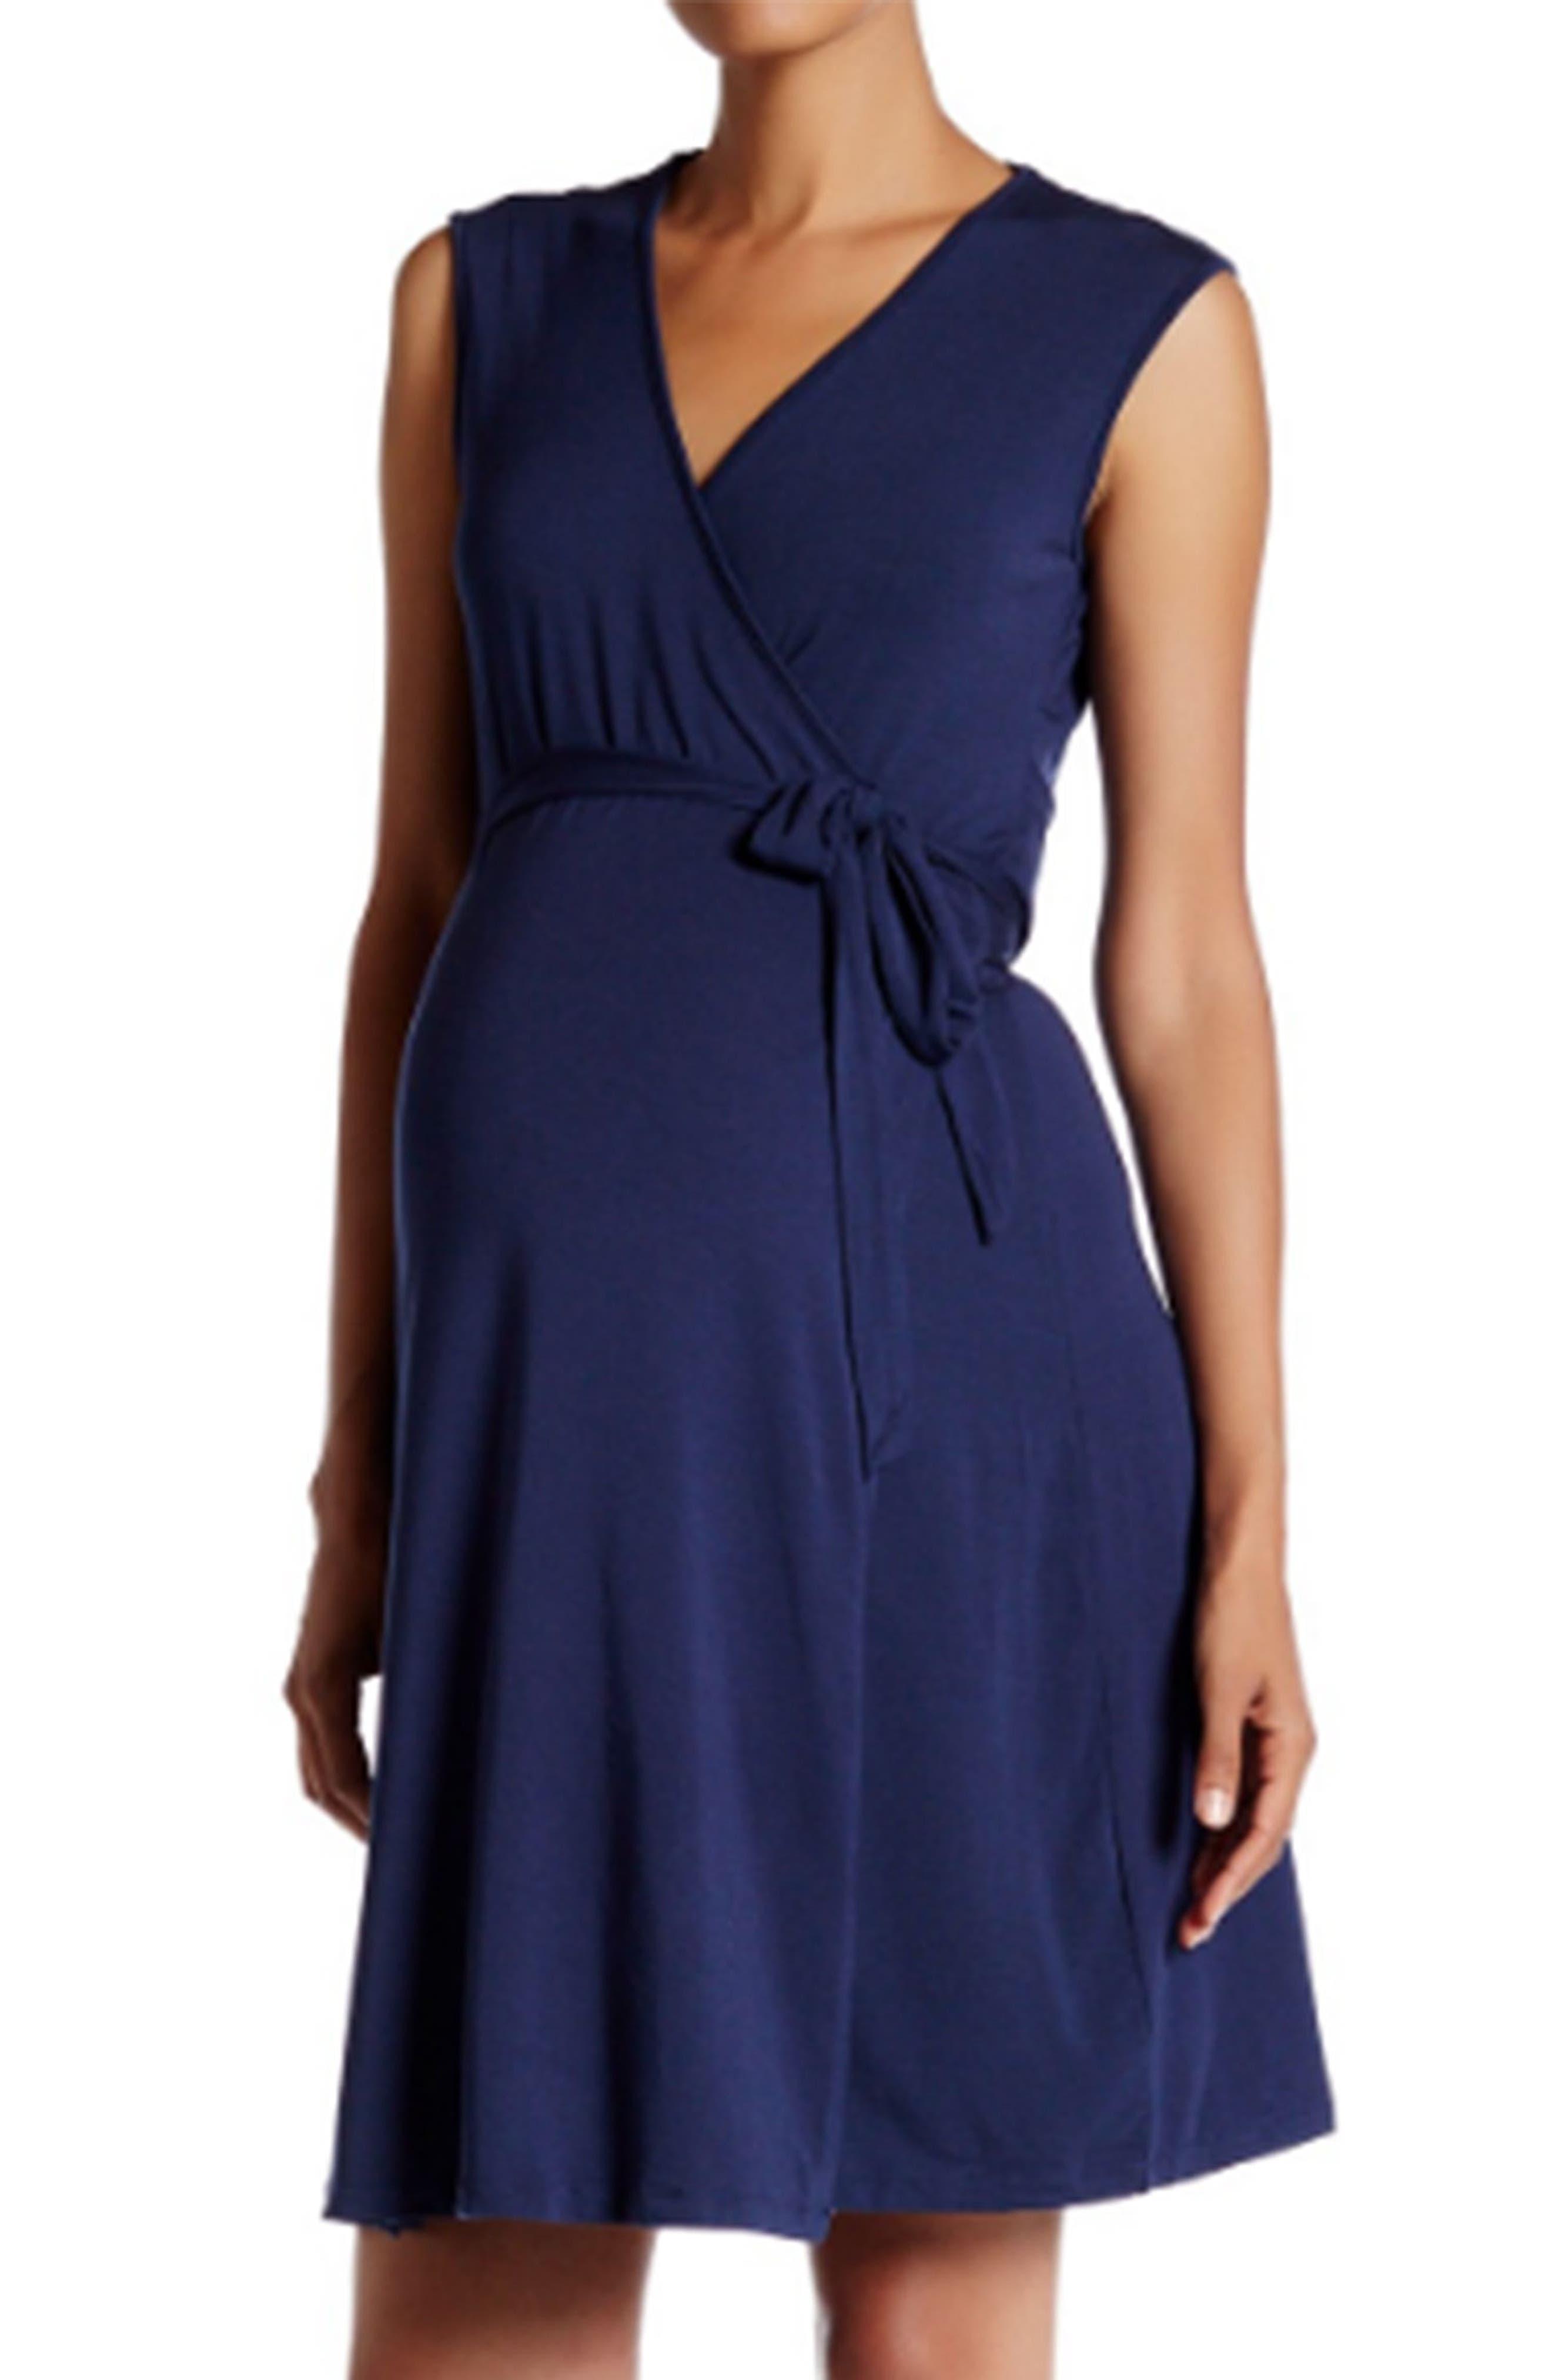 TART MATERNITY Charmaine Print Jersey Maternity Wrap Dress